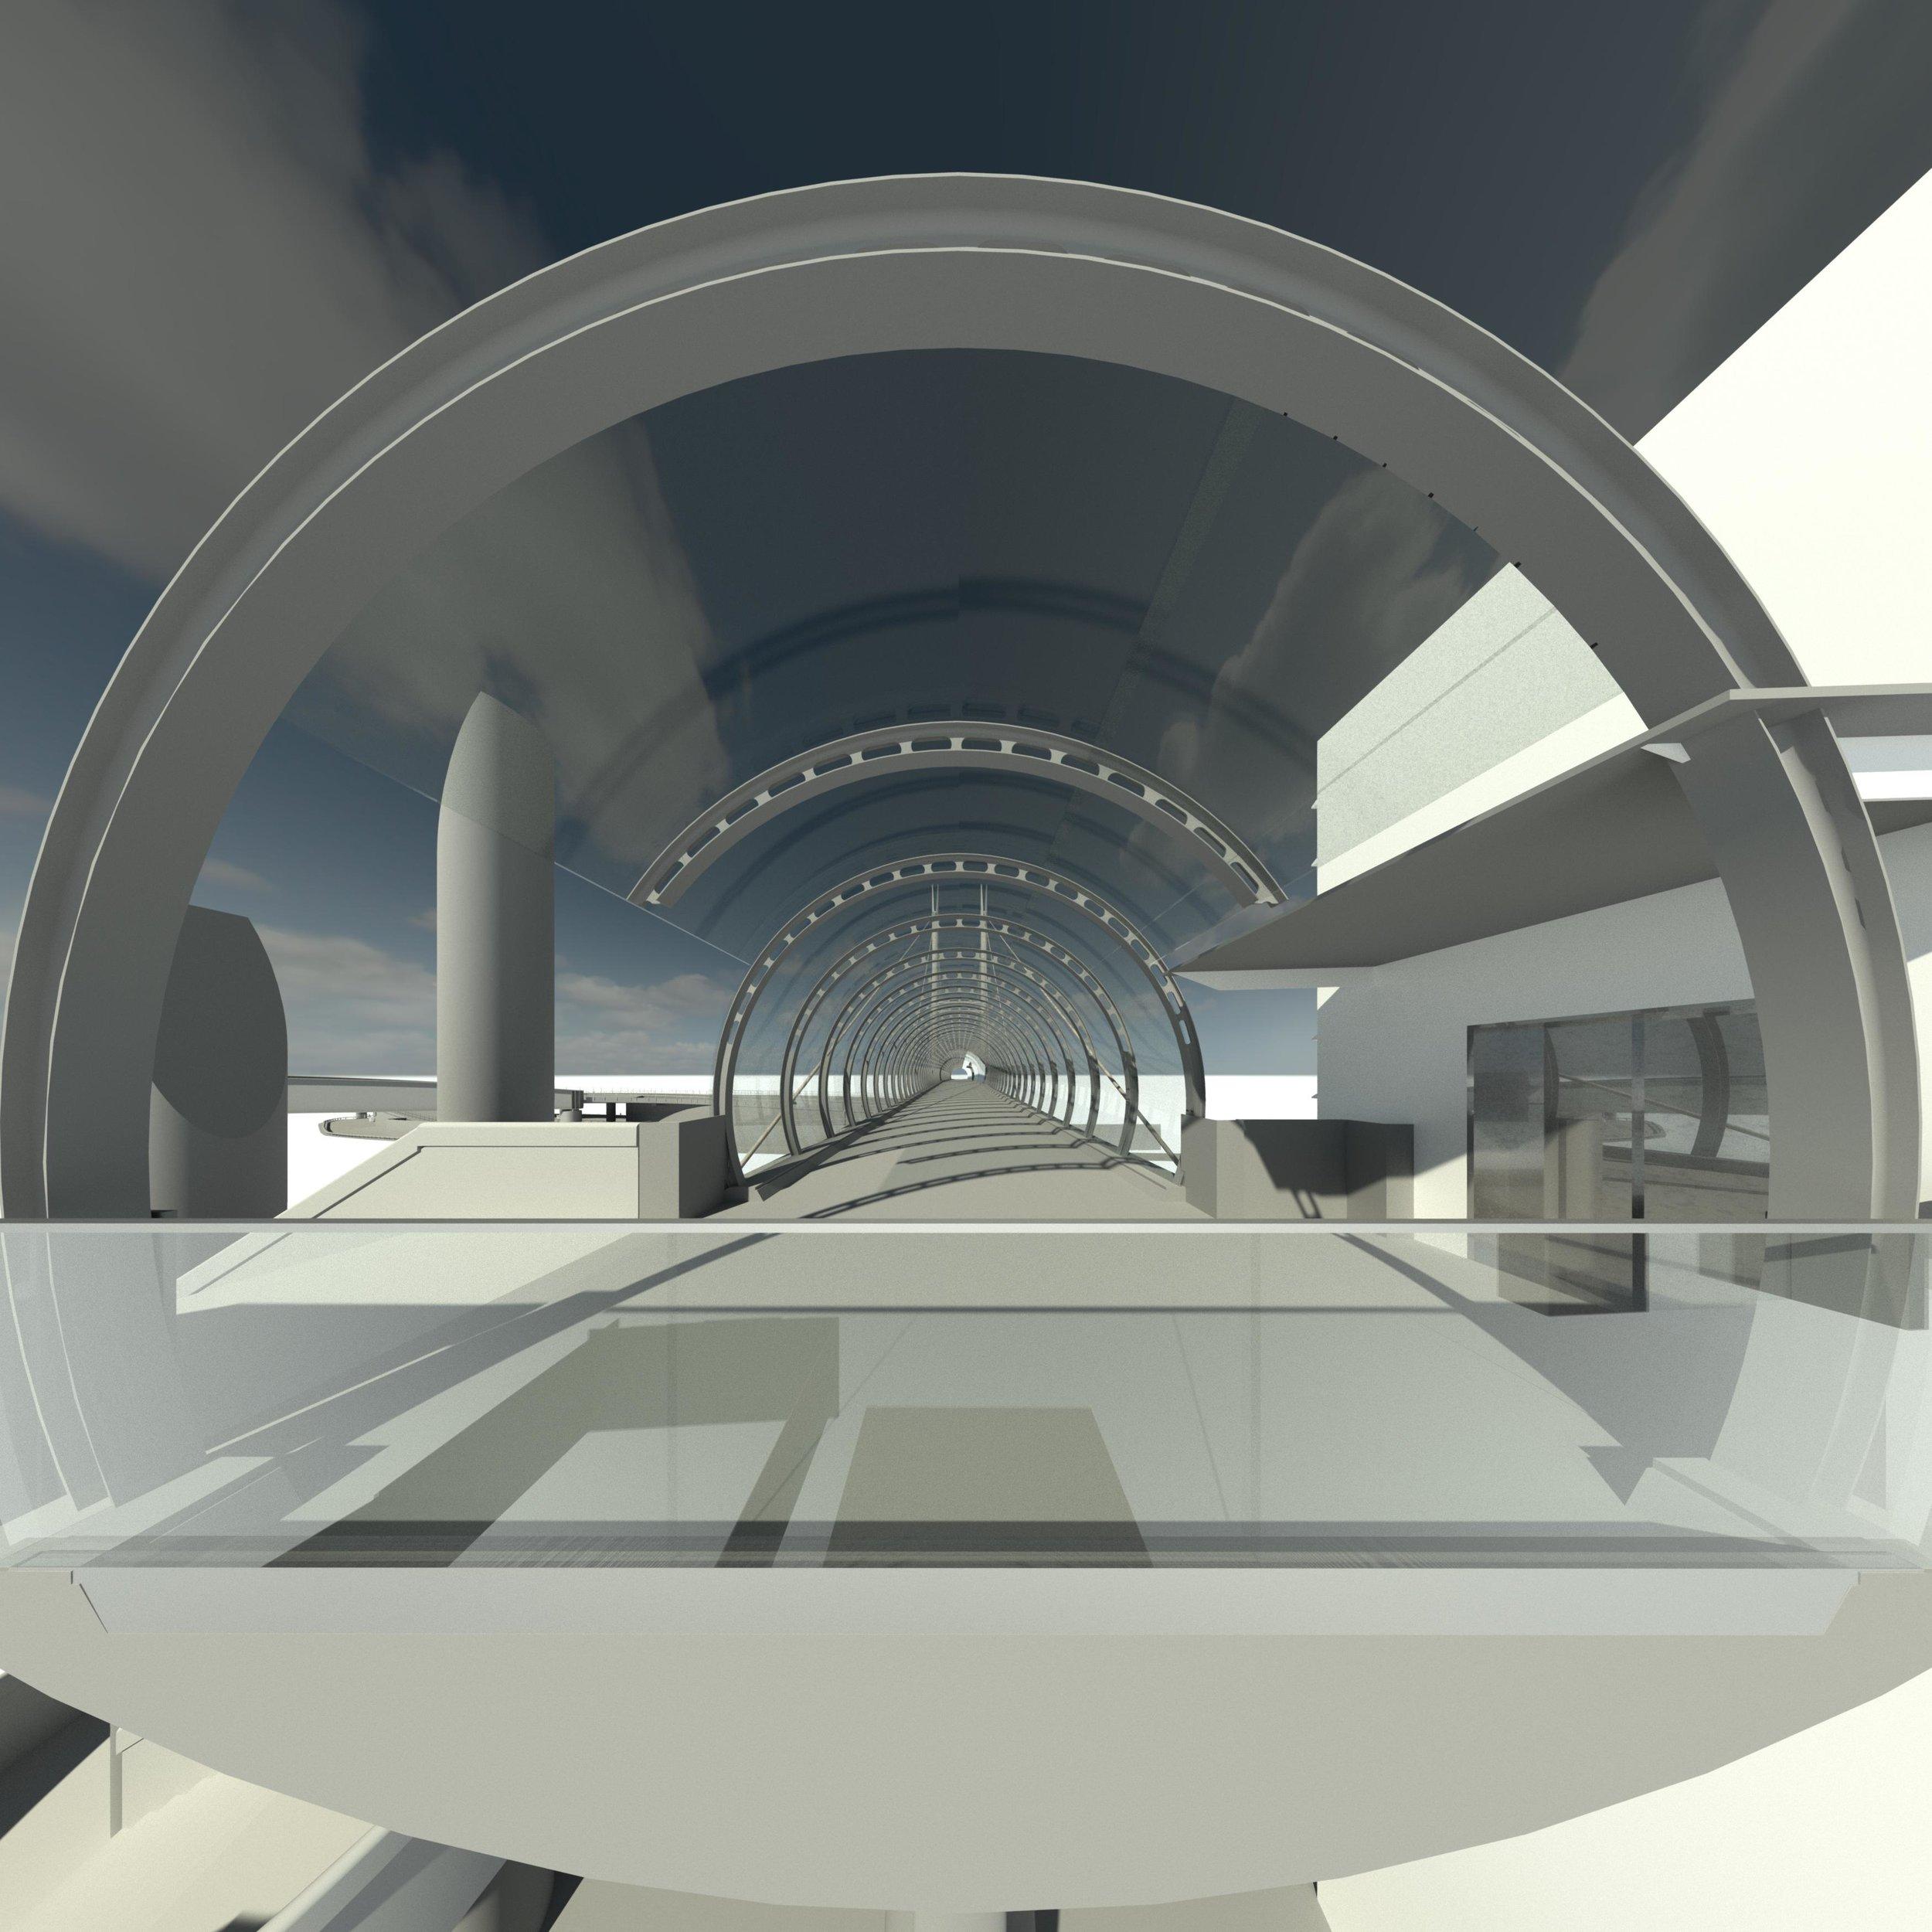 North Quay - Sector: Urban RegenerationLocation: LondonOur Client: MurphyEnd User: Canary Wharf (North Quay) ltd